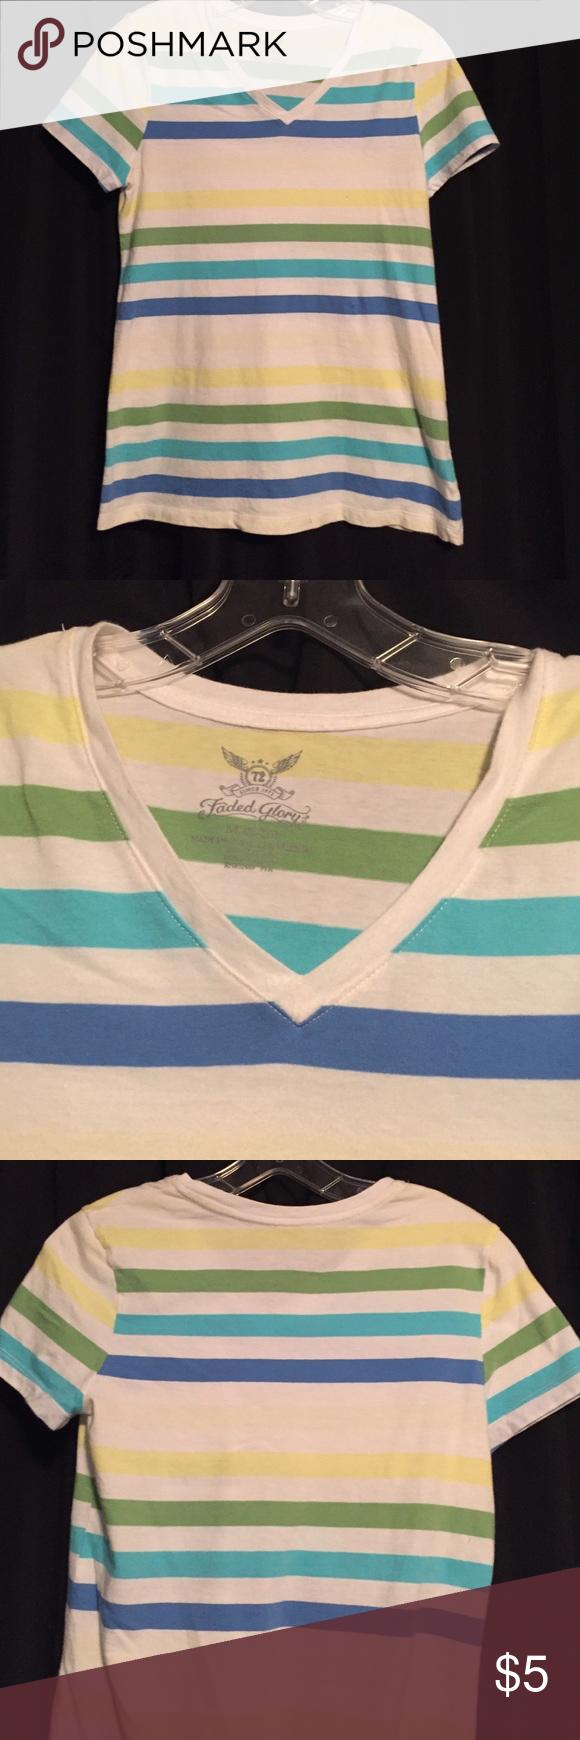 Multicolor Vee tee shirt Multicolor Vee tee shirt. 100% cotton Faded Glory Tops Tees - Short Sleeve